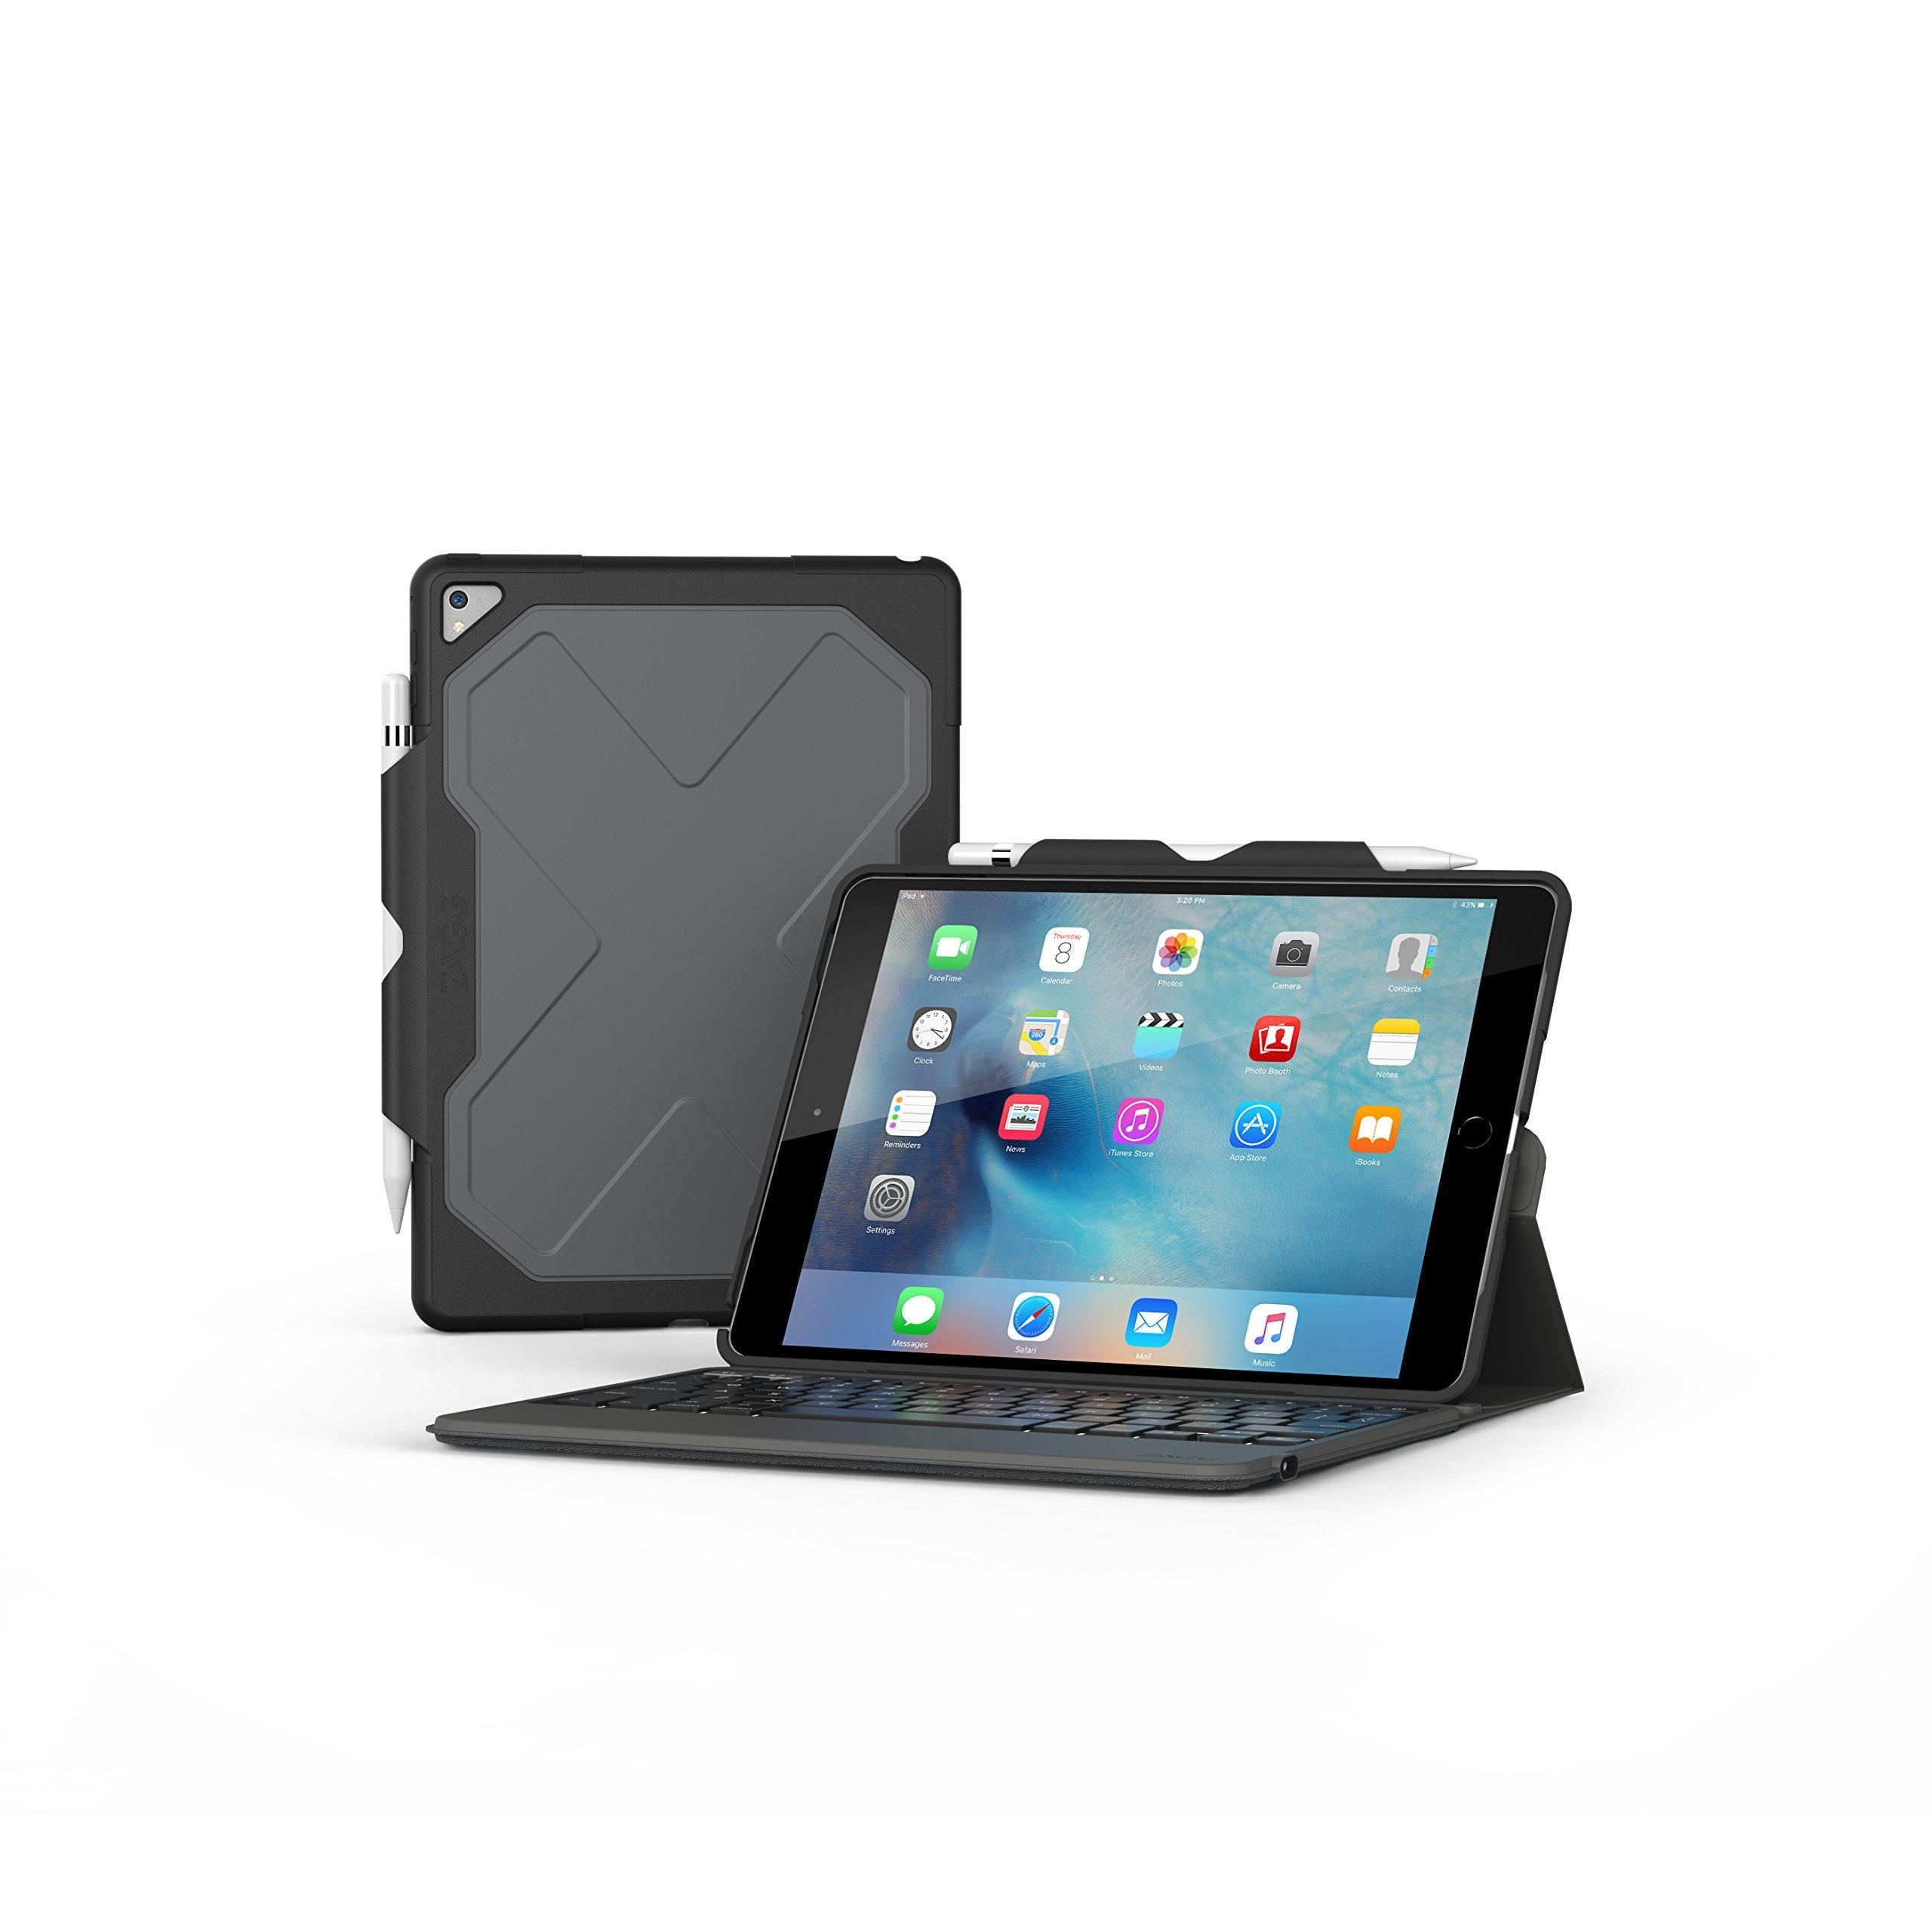 ZAGG Rugged Messenger 7 Color Backlit Case and Bluetooth Keyboard for 2017 Apple iPad Pro 10.5 - Black